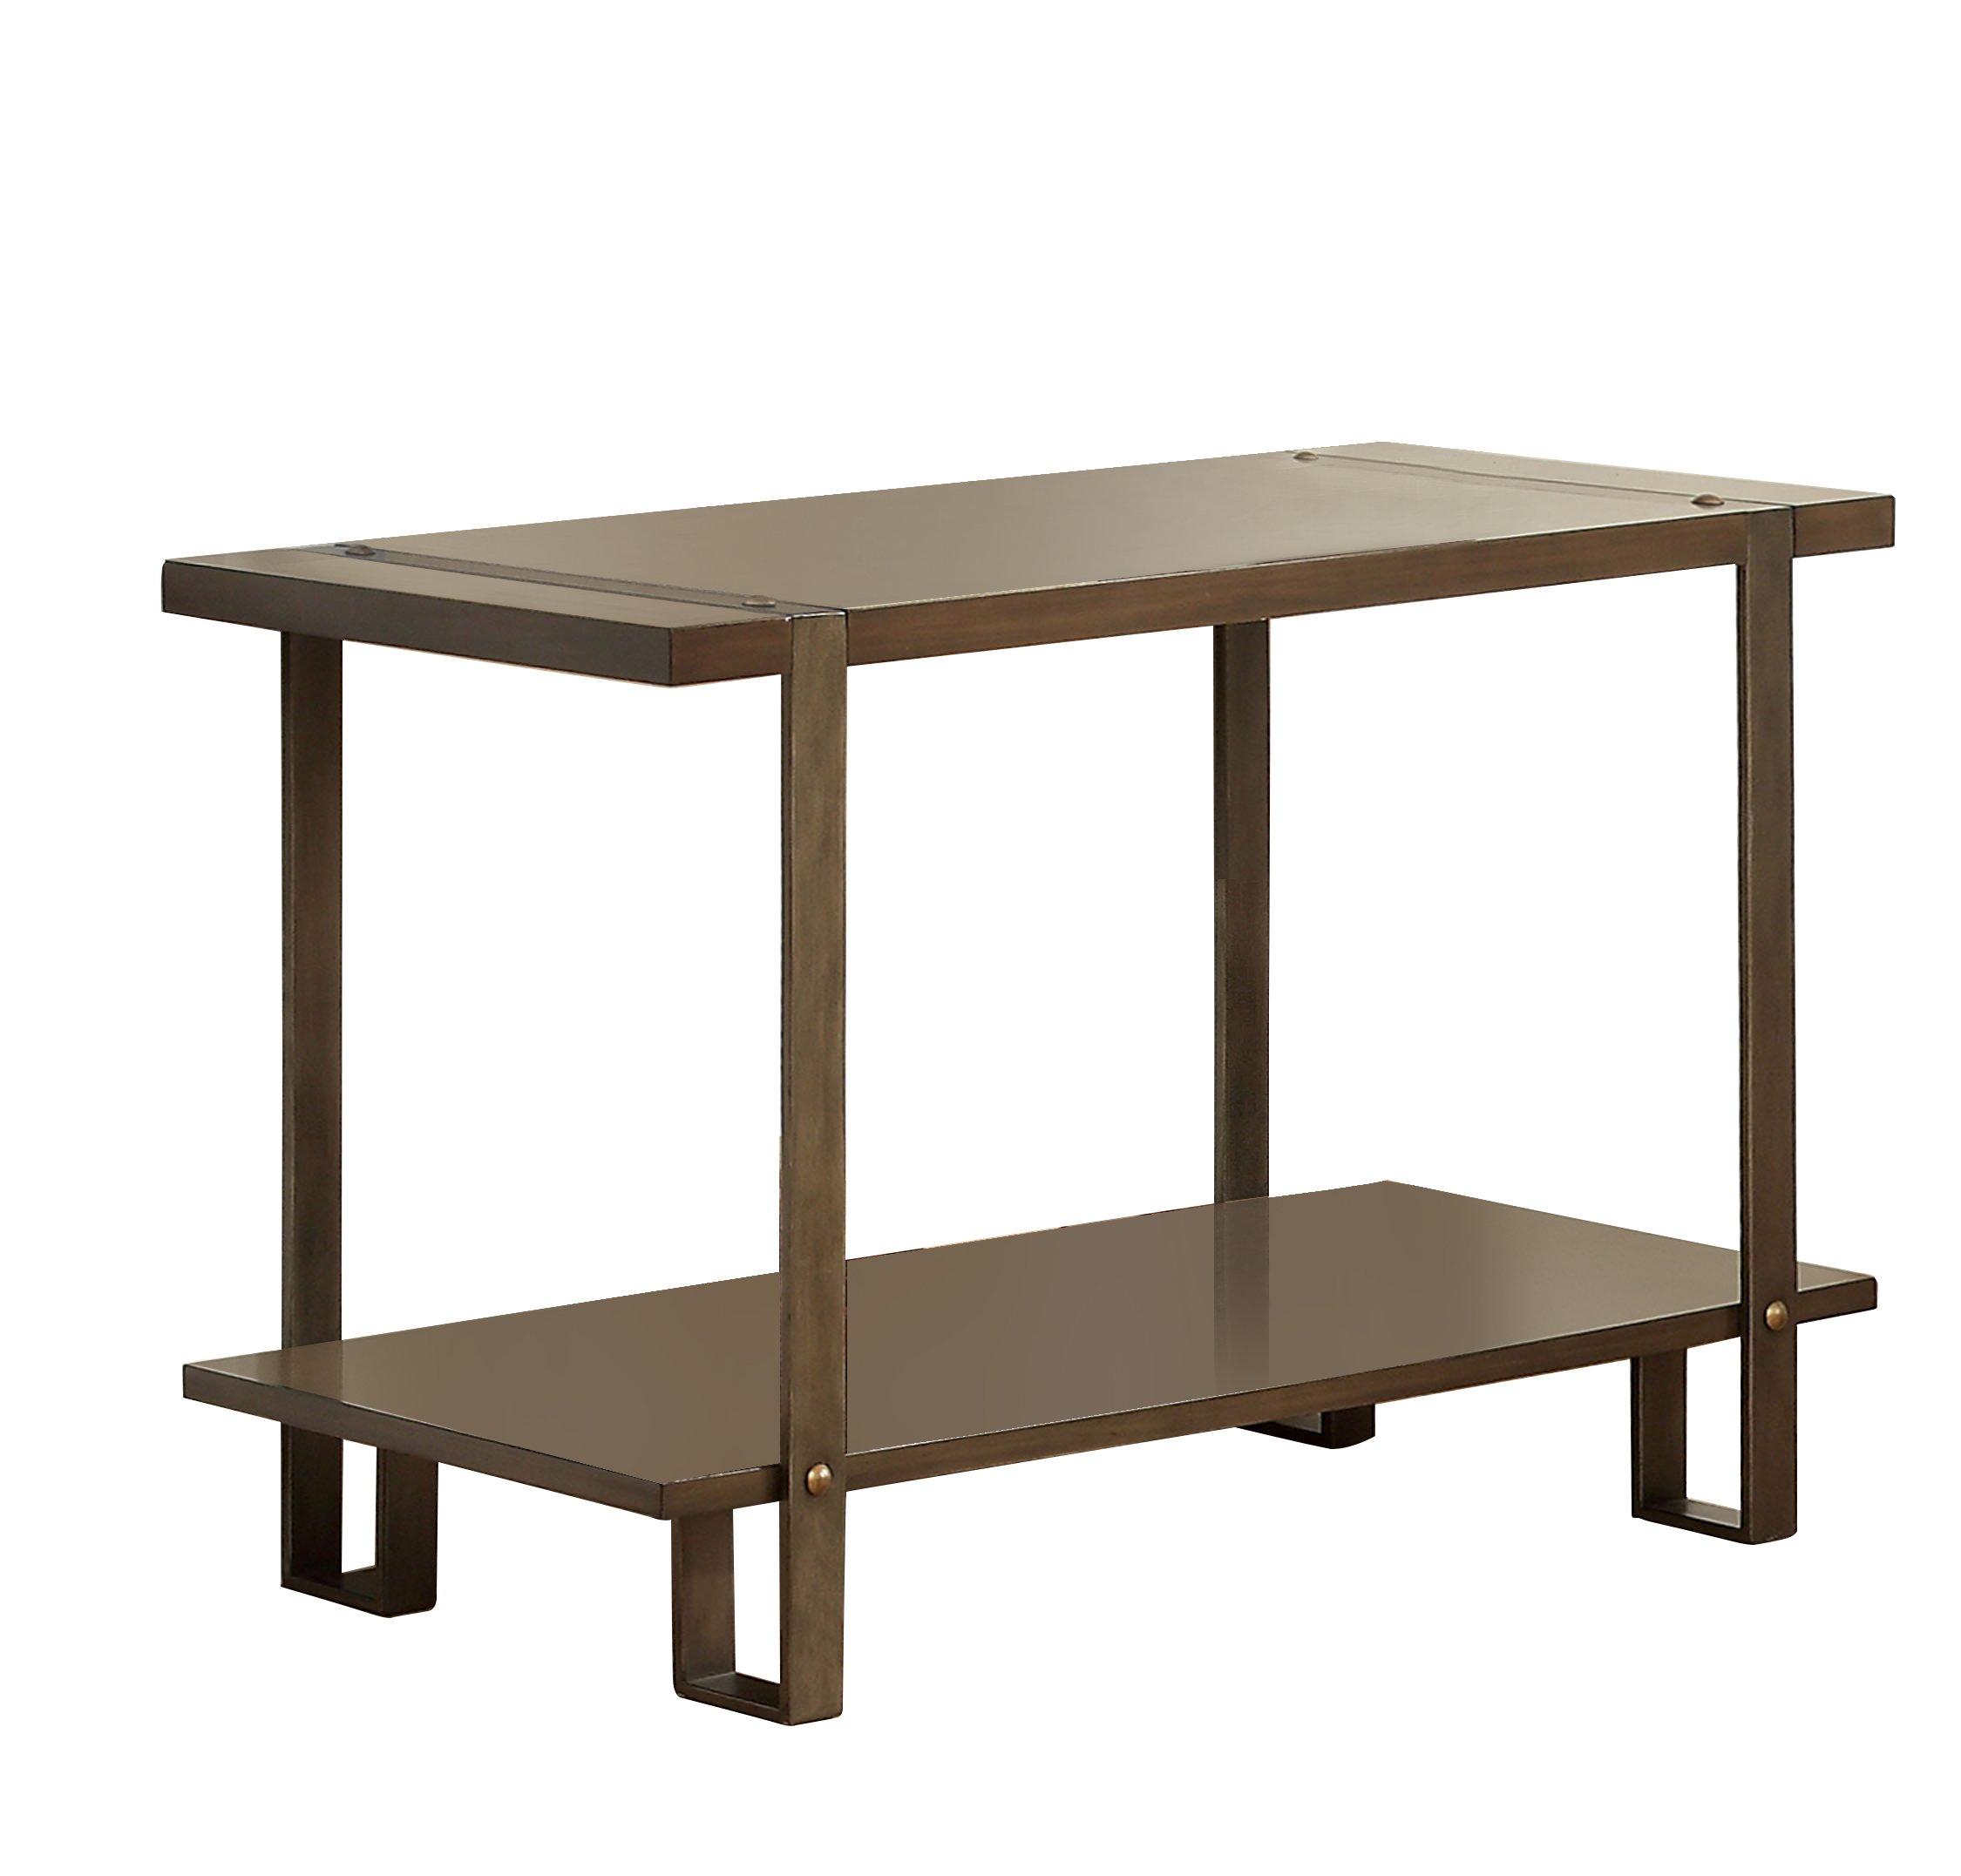 Furniture of America Barrett Rustic Sofa Table, Dark Oak